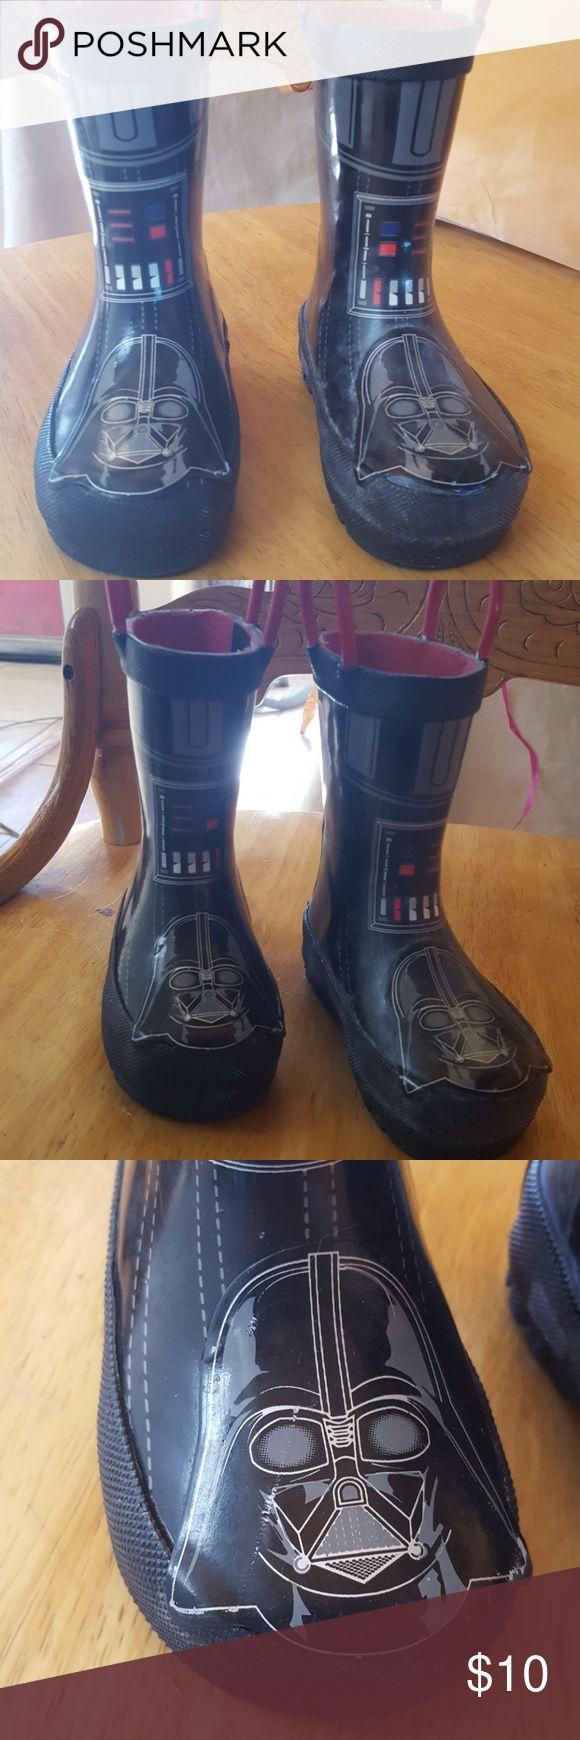 Western Chief starwars  rain boots Western Chief starwars rain boots  in great condition for the little tike in your life Western Chief starwars Shoes Rain & Snow Boots